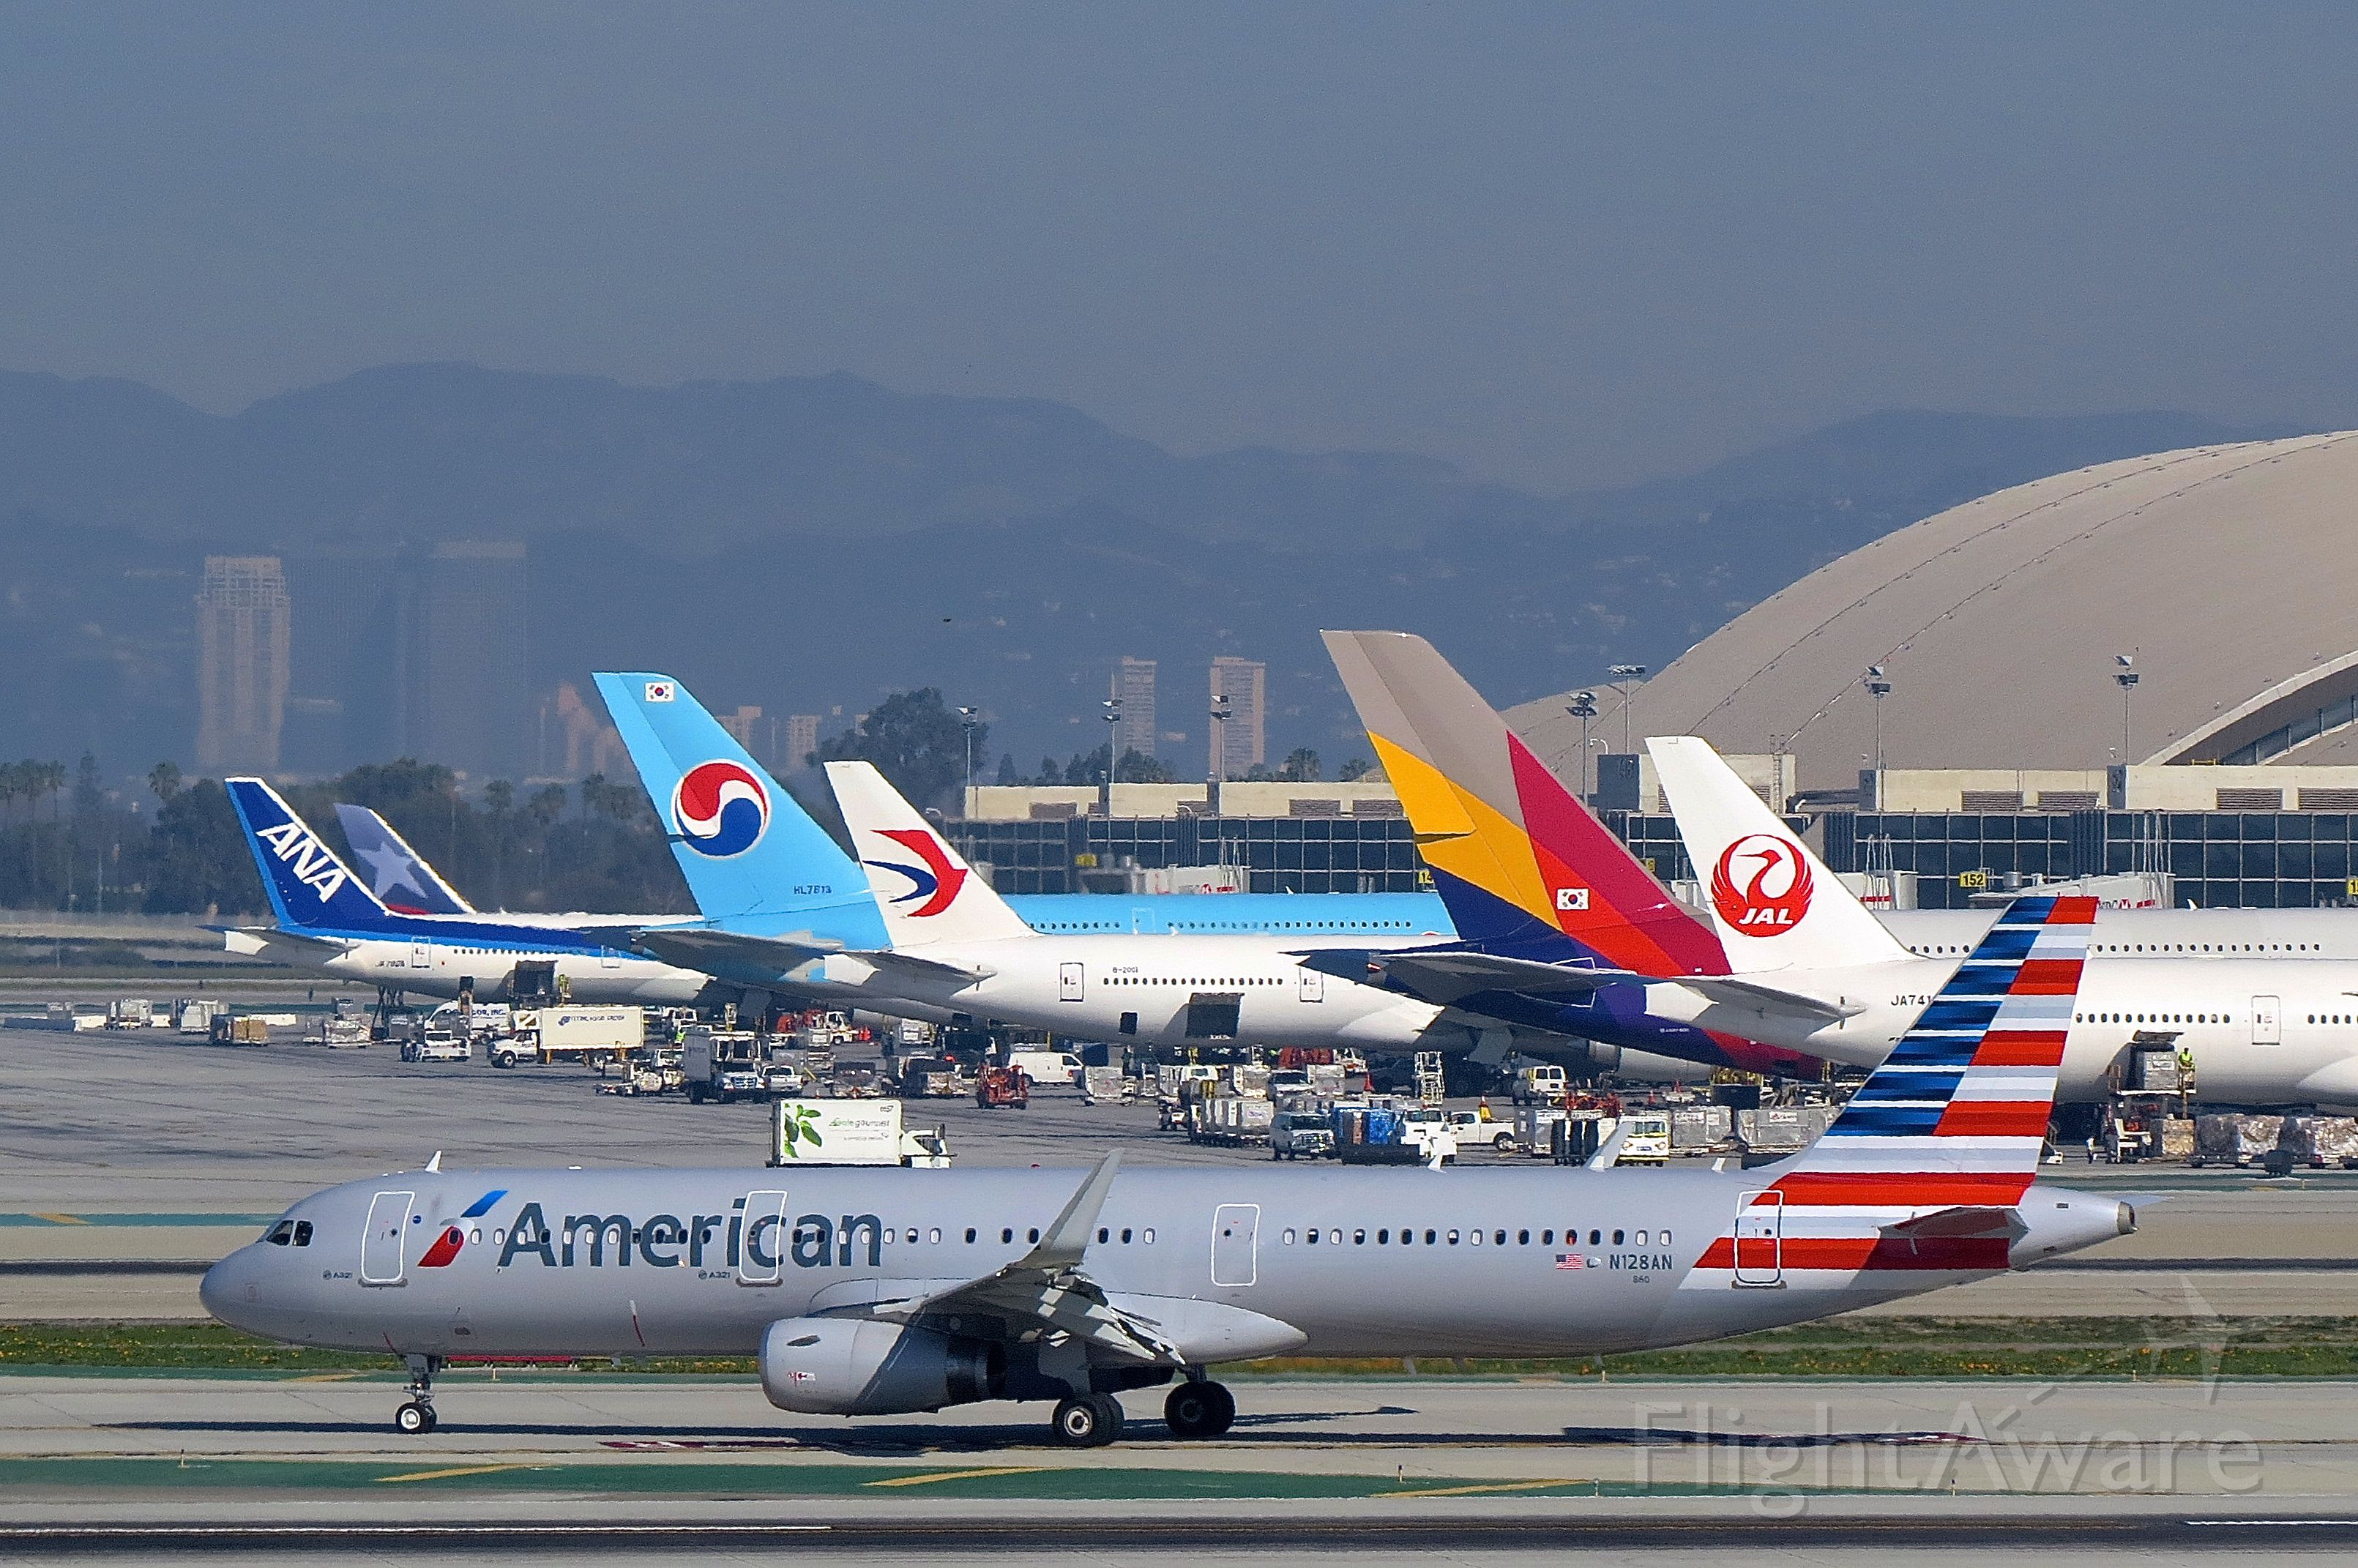 "Airbus A321 (N128AN) - <a rel=""nofollow"" href=""http://flightaware.com/live/flight/N128AN/history/20150201/1520Z/KDFW/KLAX"">https://flightaware.com/live/flight/N128AN/history/20150201/1520Z/KDFW/KLAX</a>"